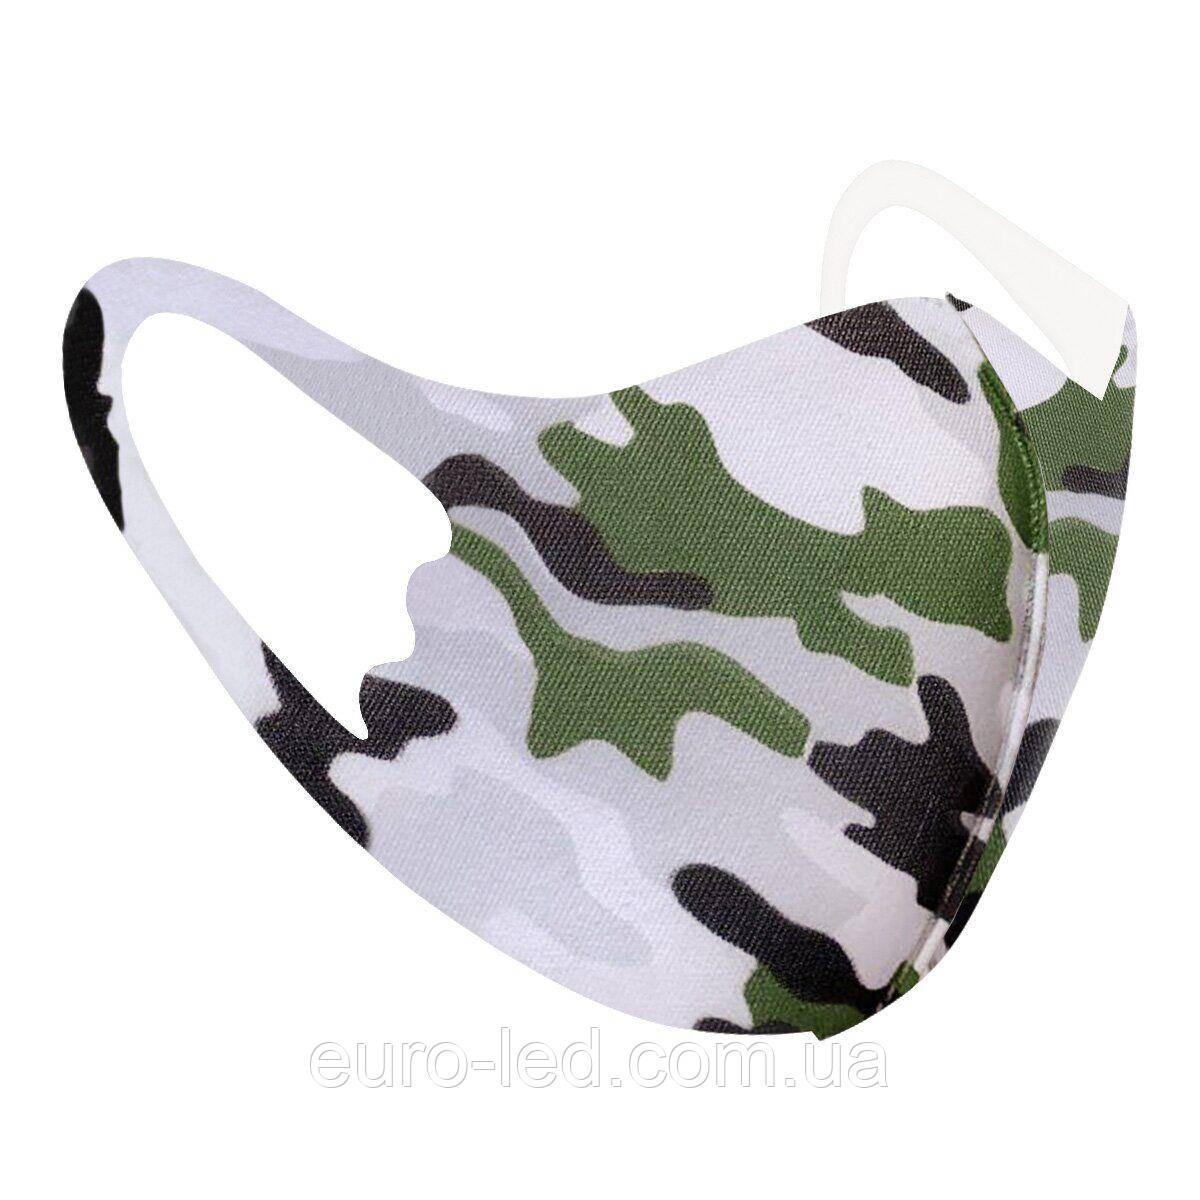 Защитная маска Pitta Military PС-MG, размер:детский, military зеленый